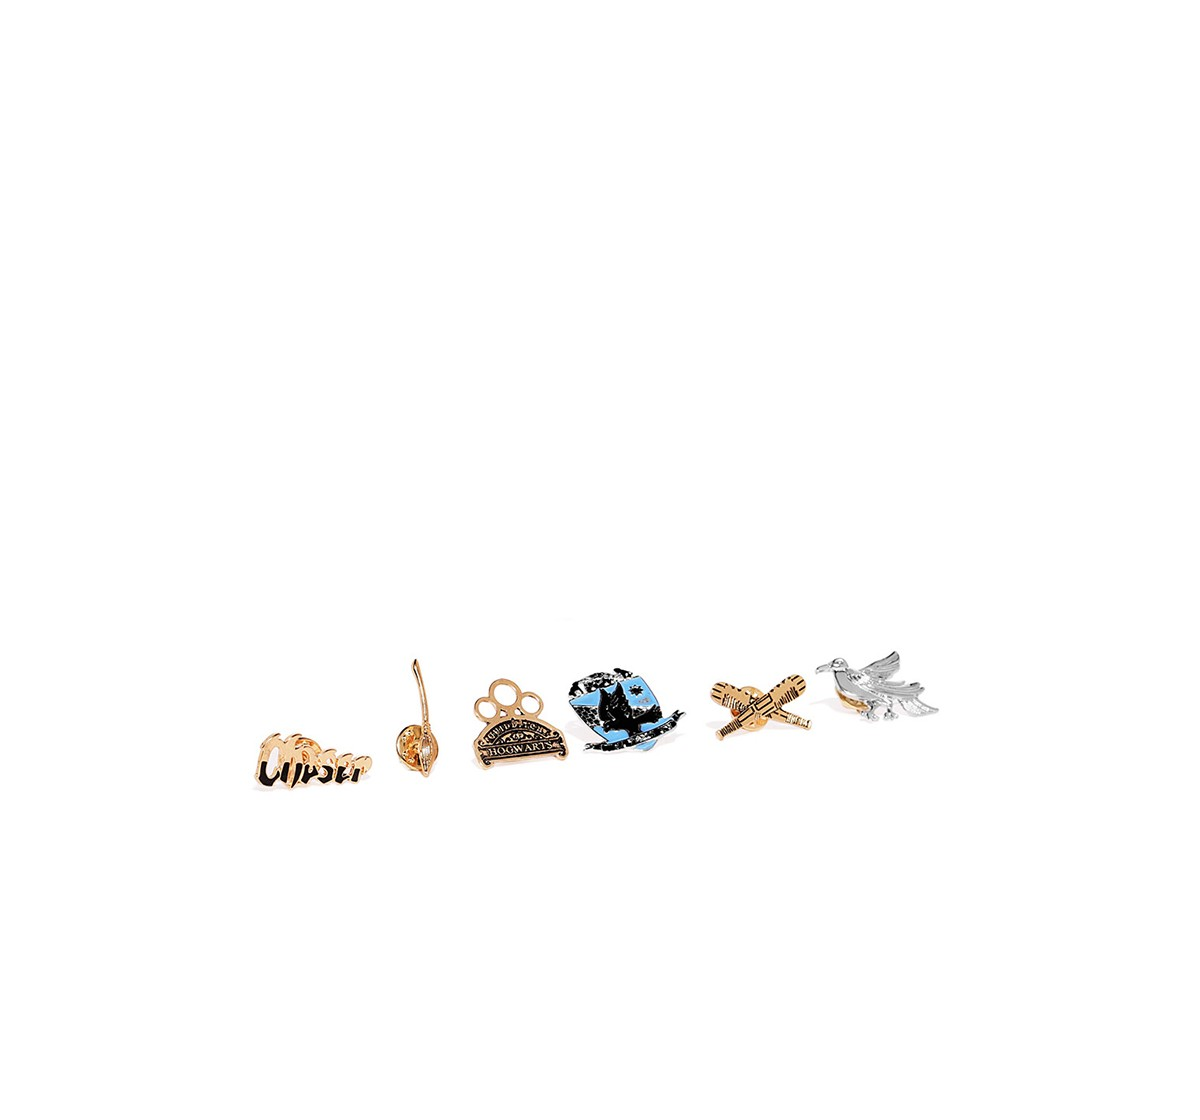 Efg Harry Potter Ravenclaw House Pin Set  for Kids age 7Y+